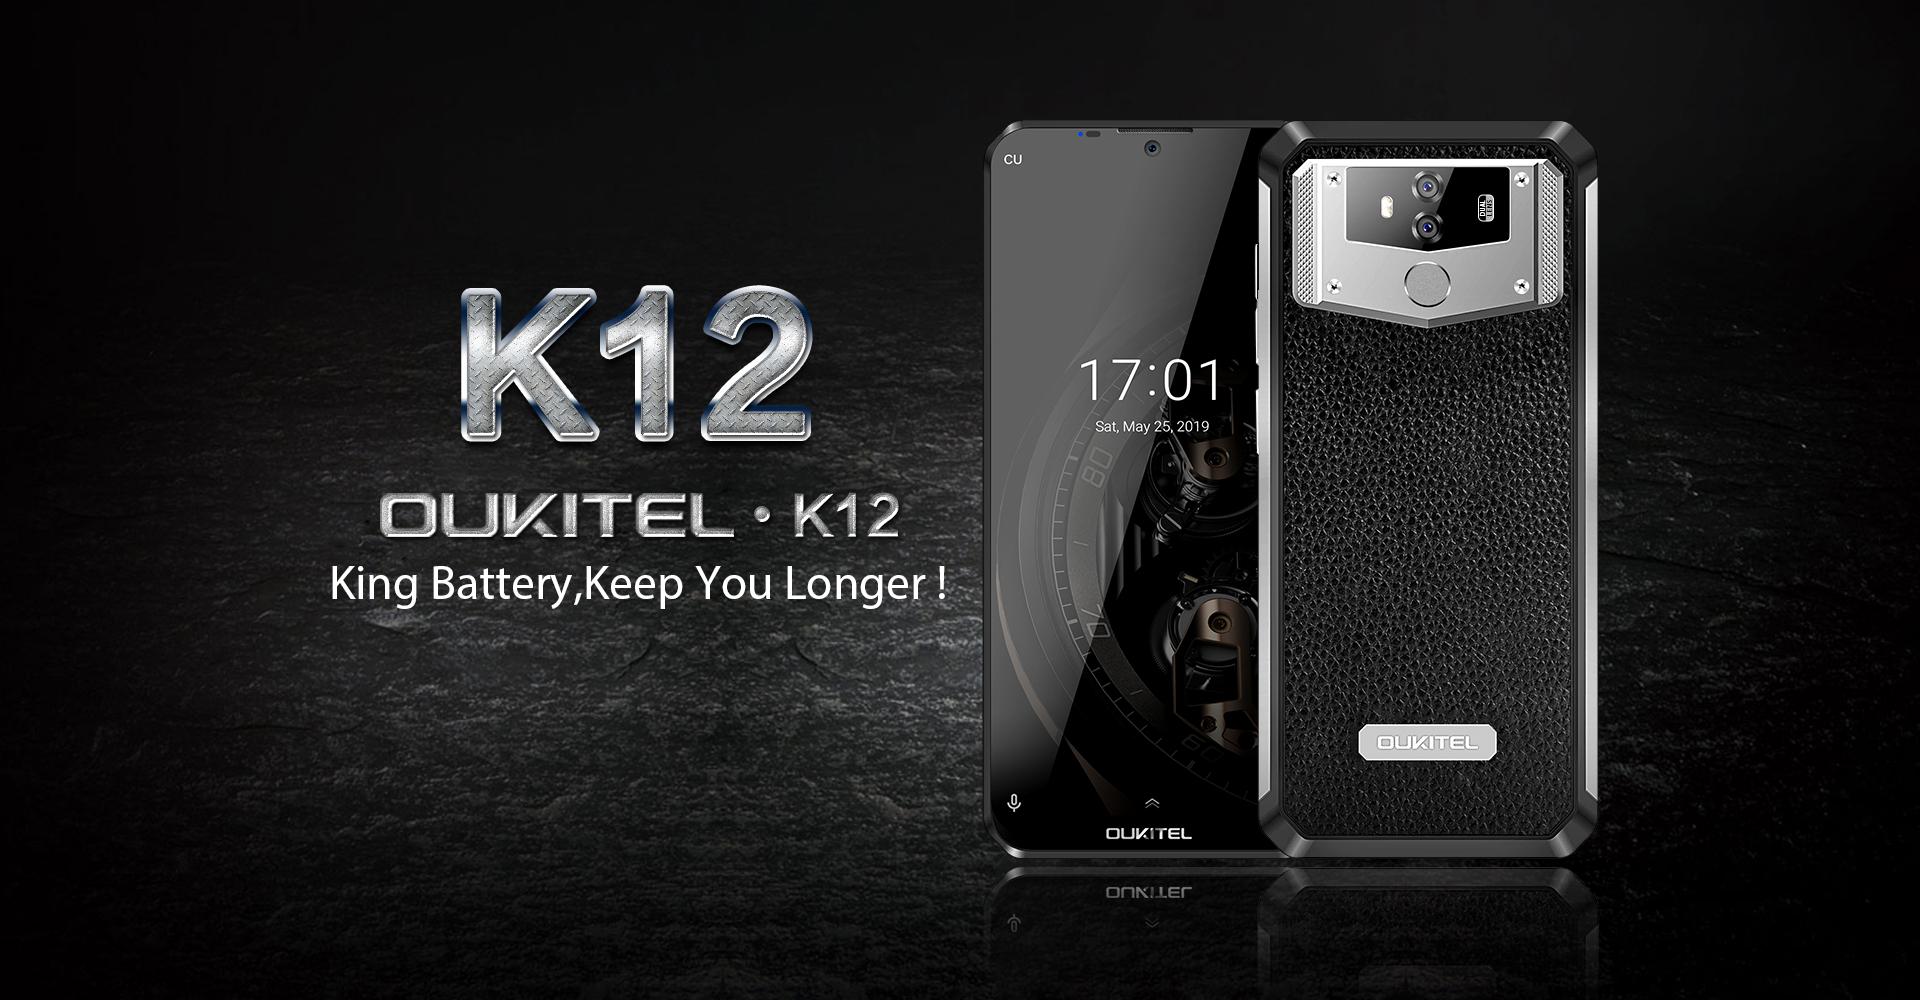 oukitel-k12.jpg